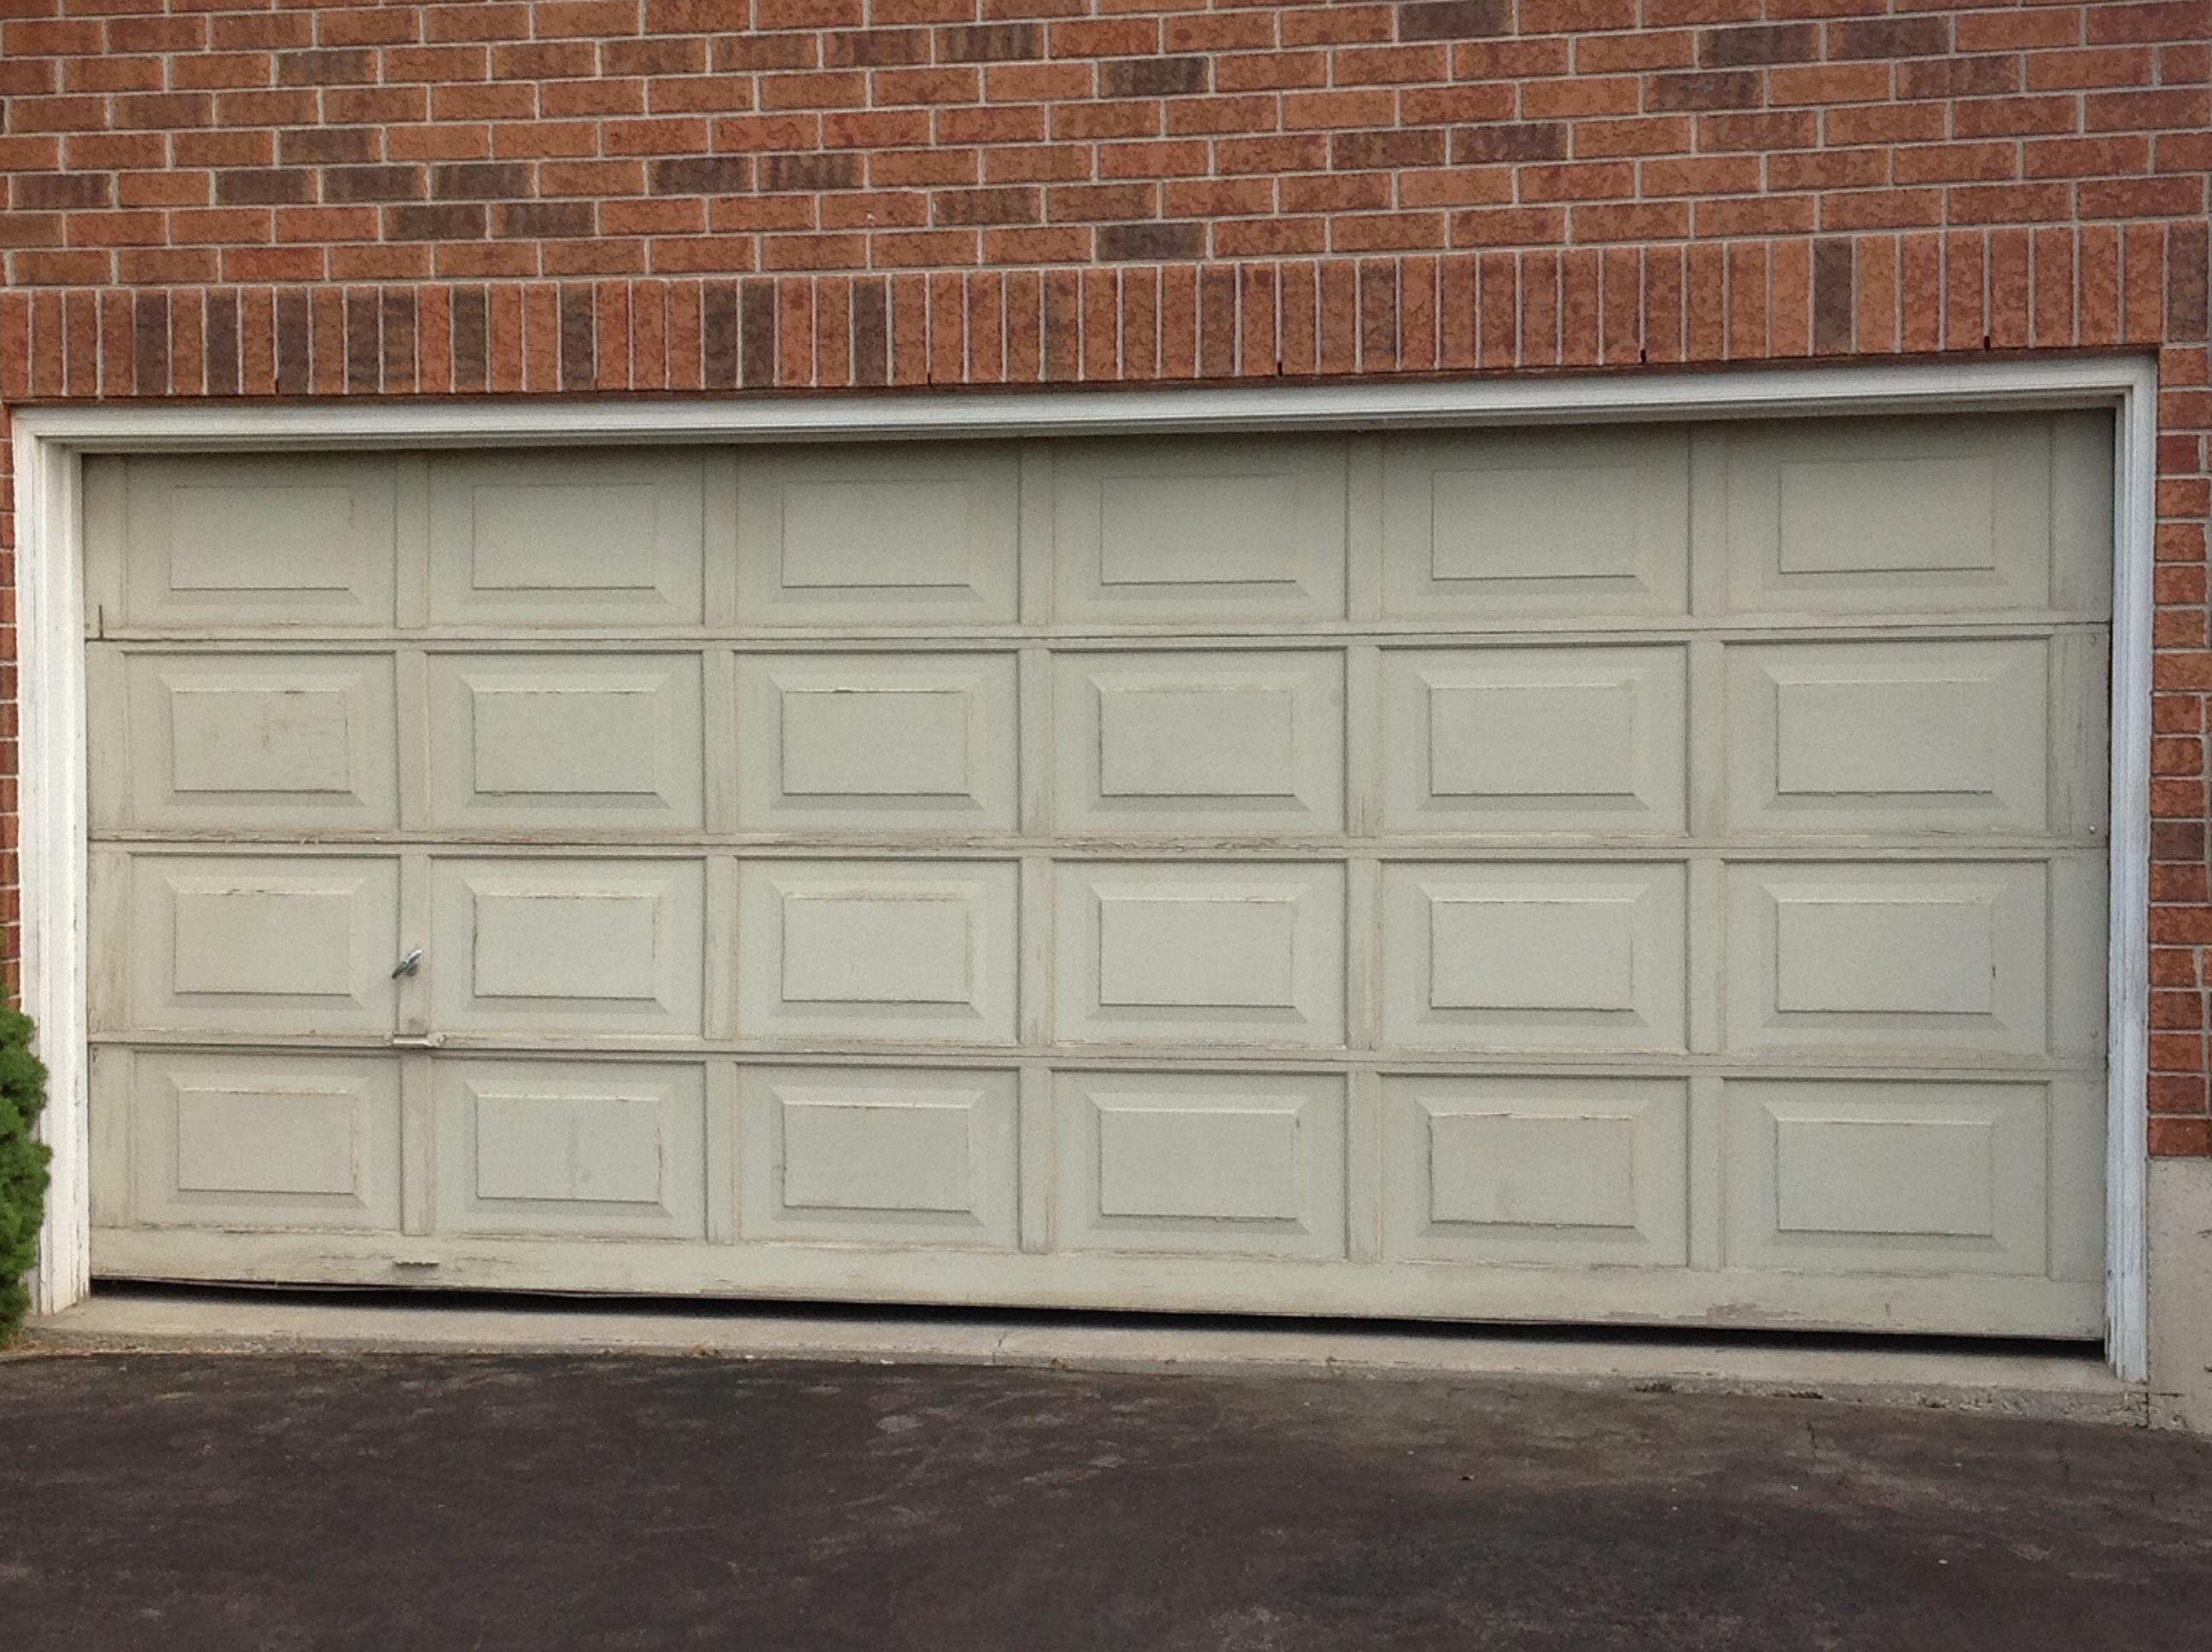 1936 #724B39 Residential Garage Doors Hamilton Door Systems save image Garage Doors Systems 35872592